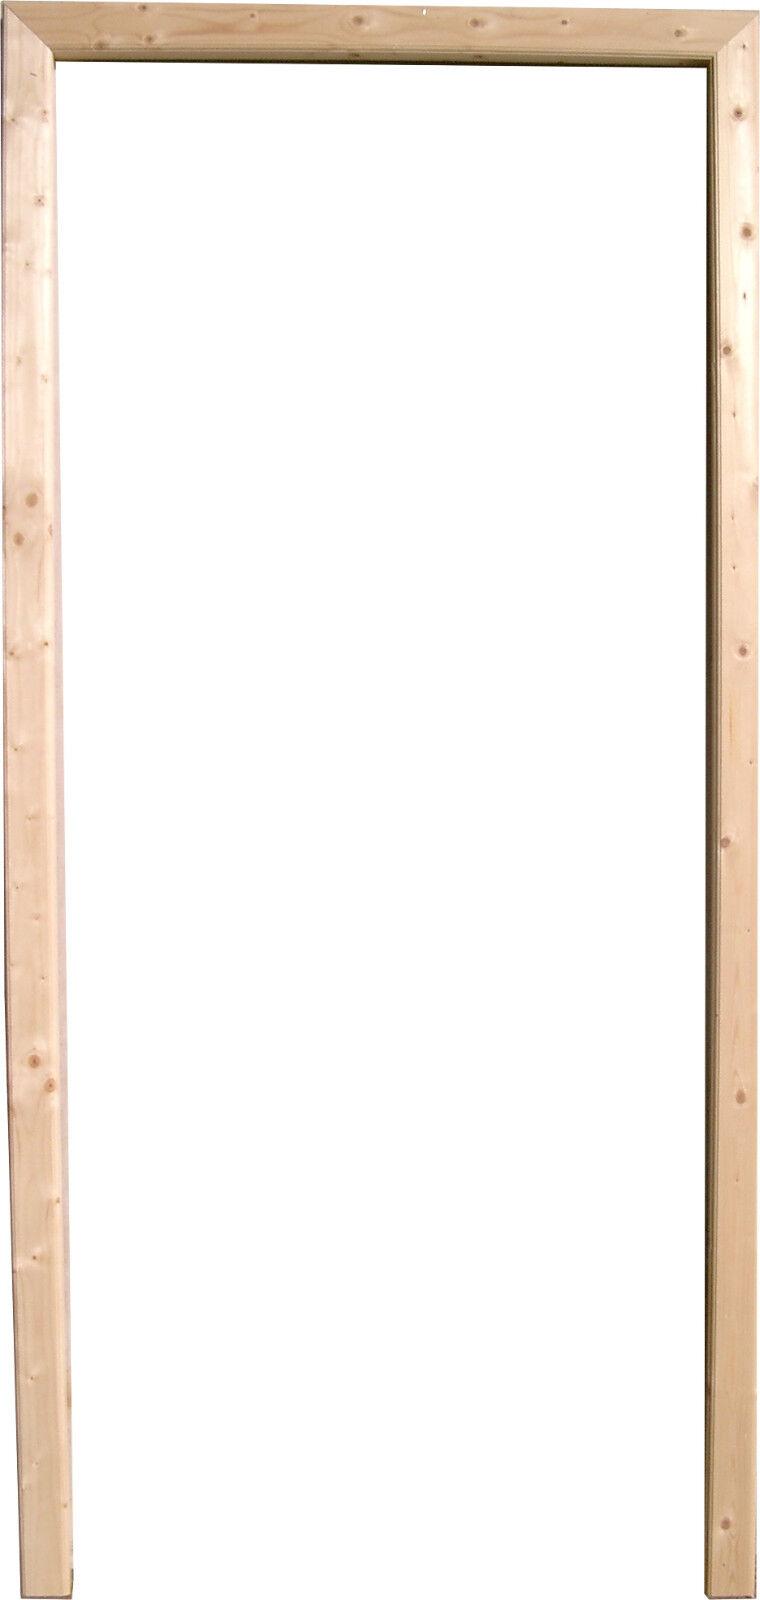 Türzarge Massivholz Fichte massiv roh Sonderpreis günstig 73,5x198,5x12cm Links